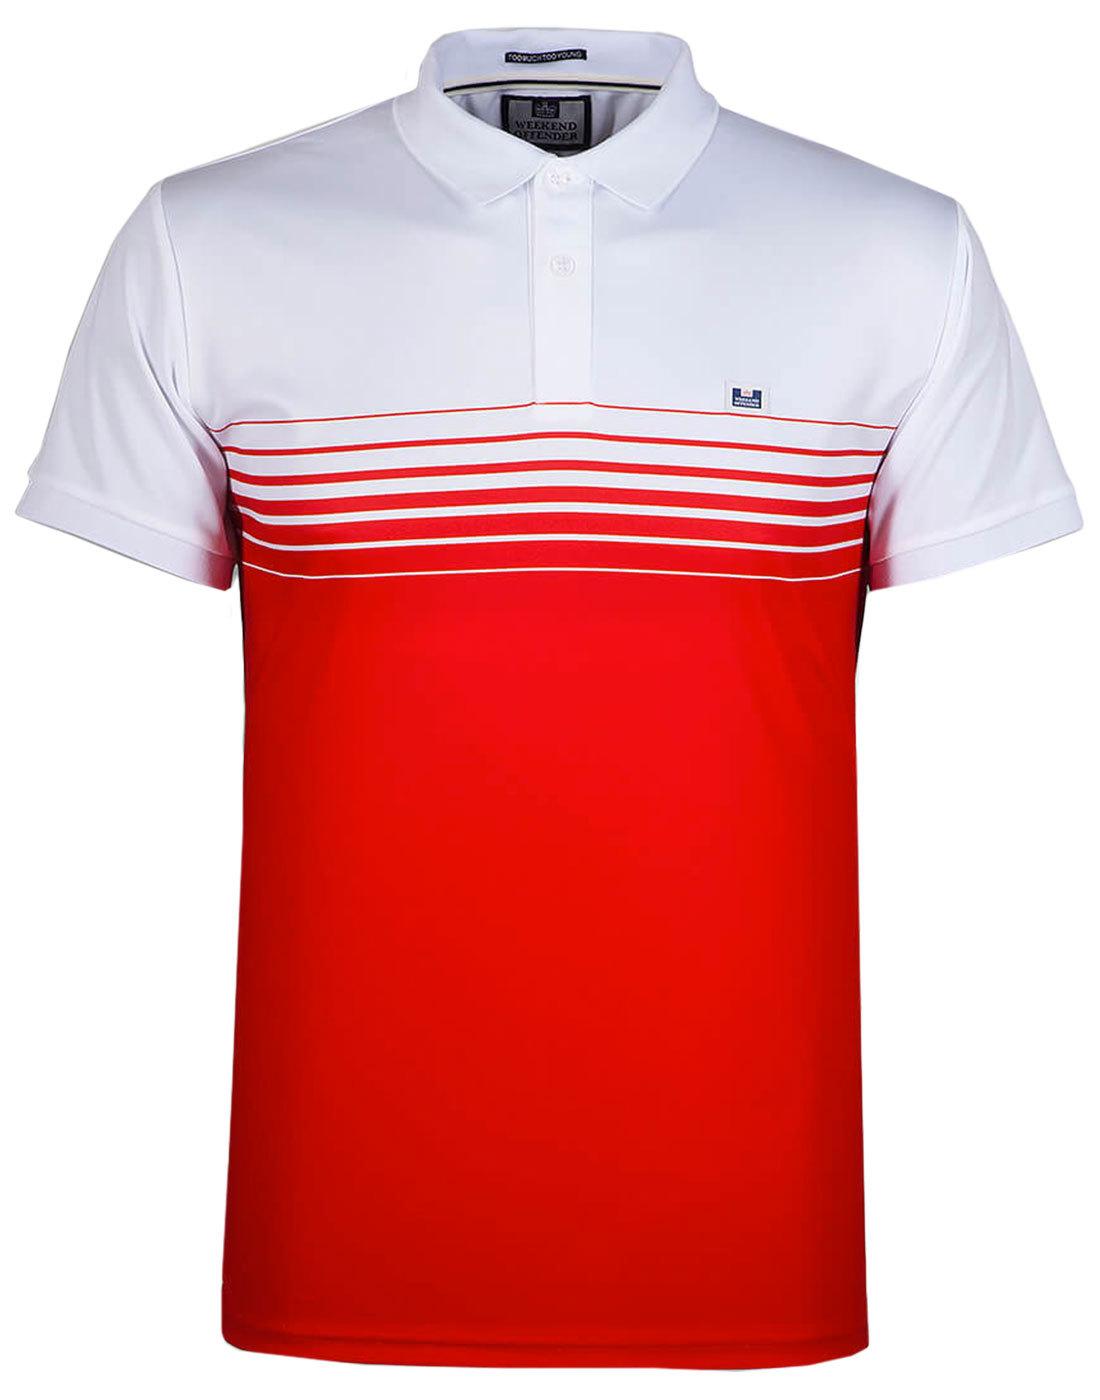 Wolfram WEEKEND OFFENDER Men's Retro Polo Shirt